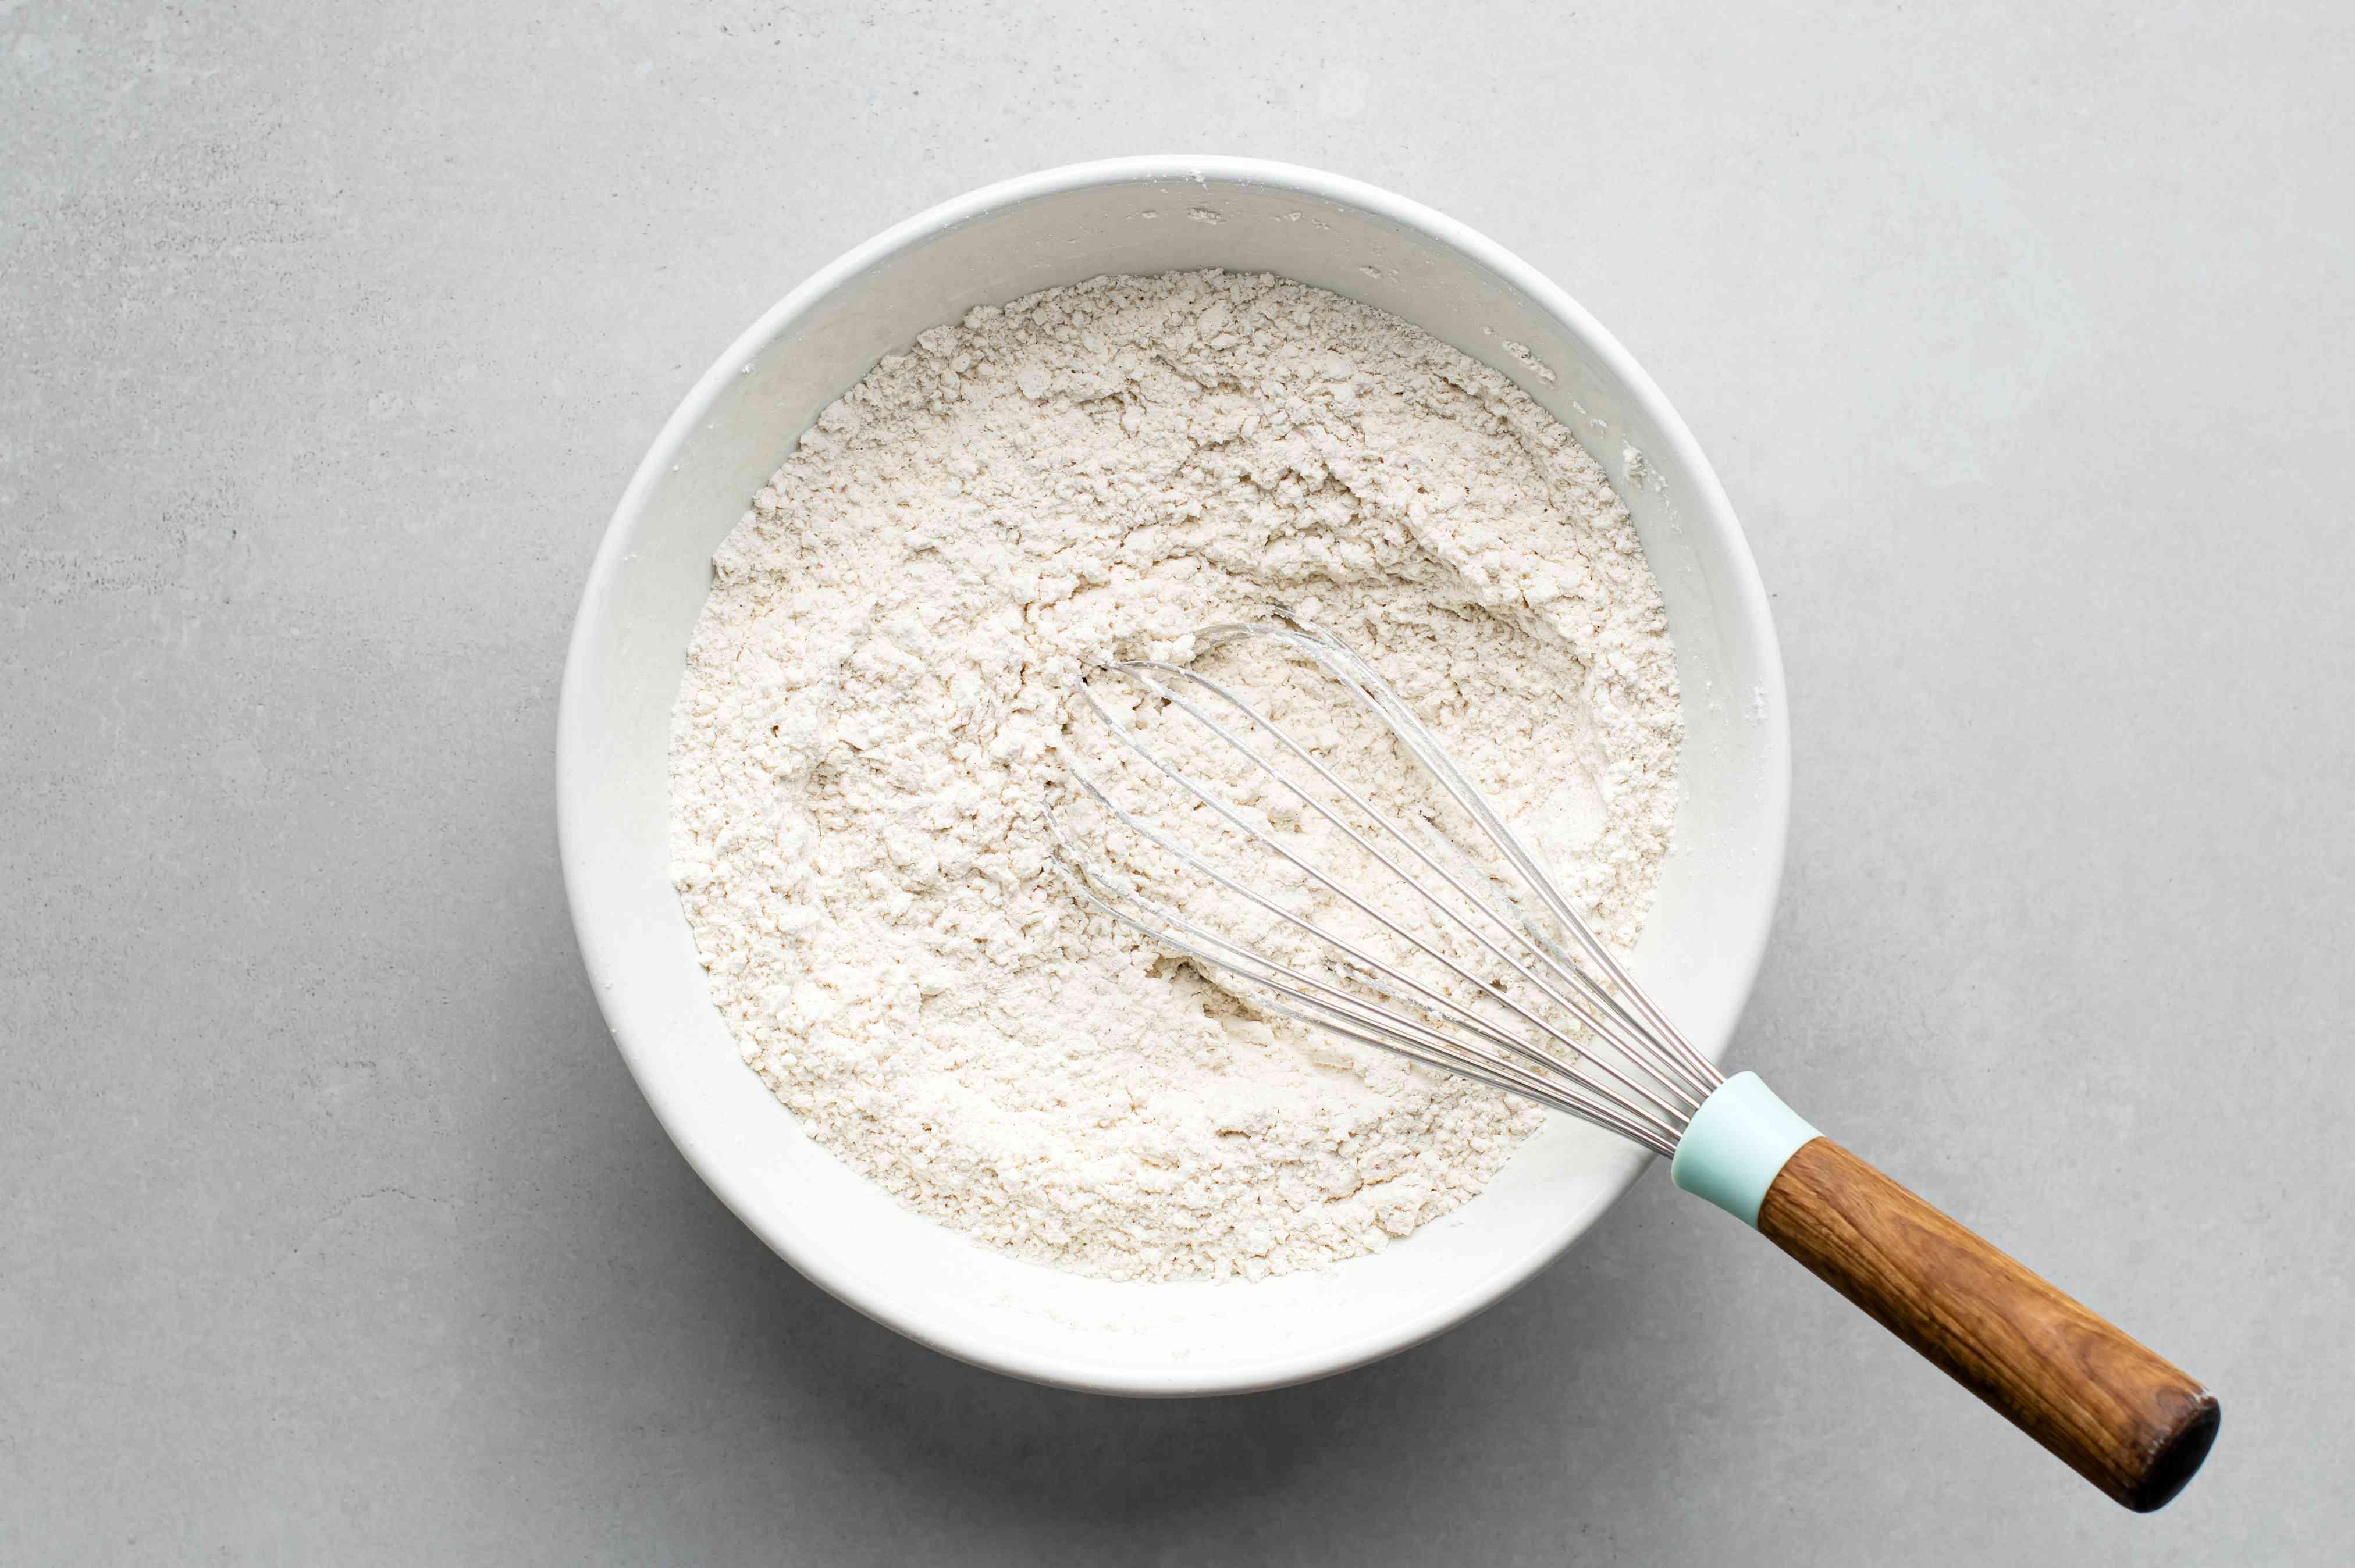 flour, sugar, baking powder, cinnamon, and salt together in a large bowl